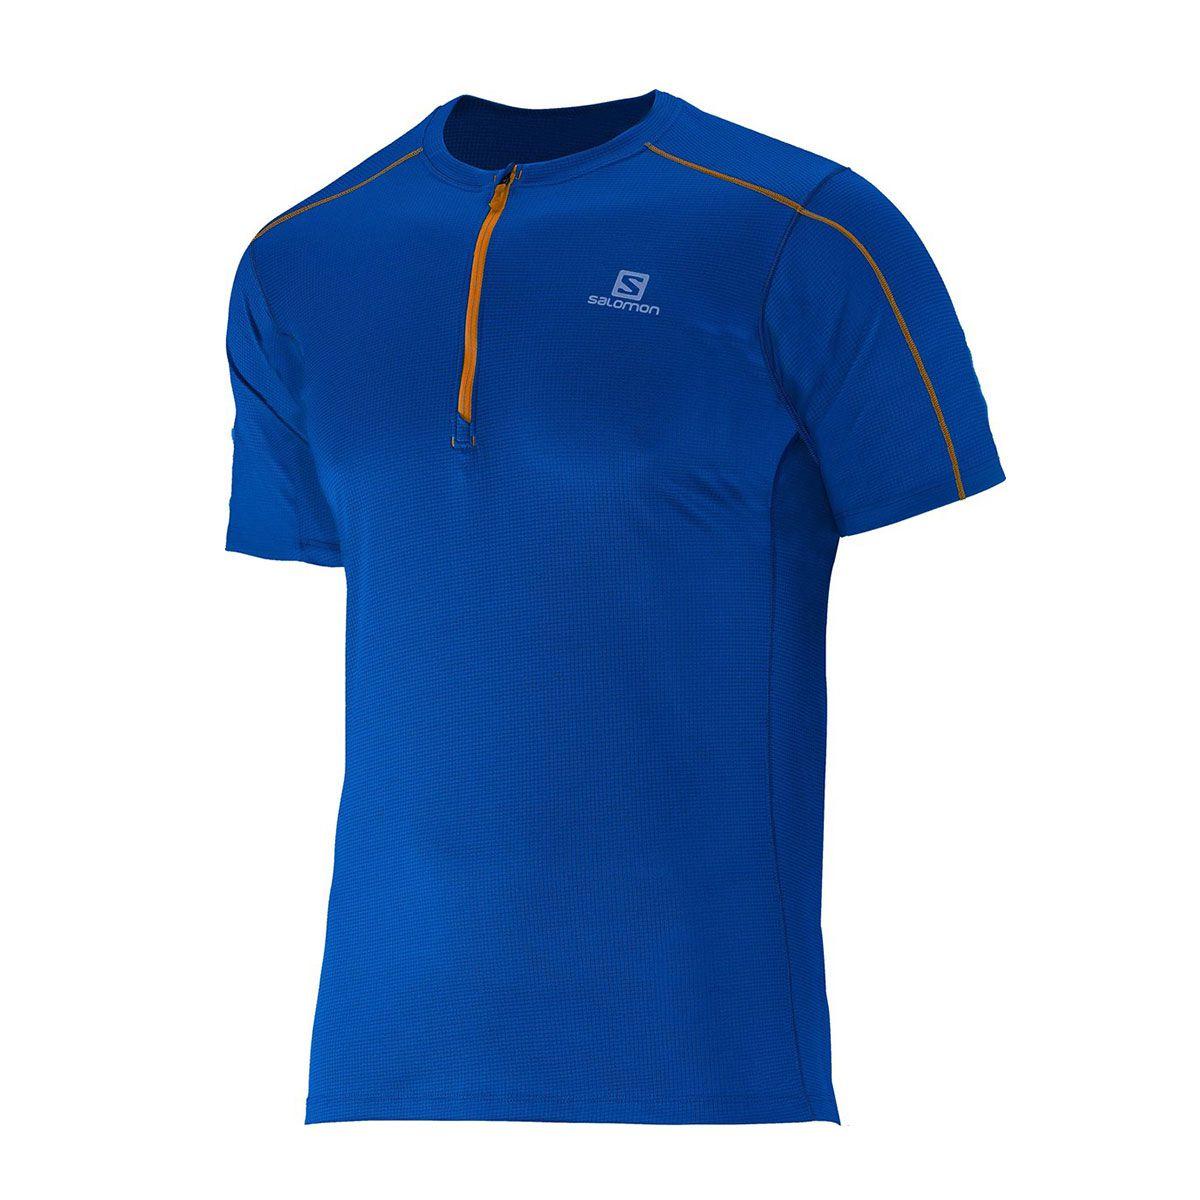 Camiseta Salomon Action 1/2 Zip Masculina Azul Royal